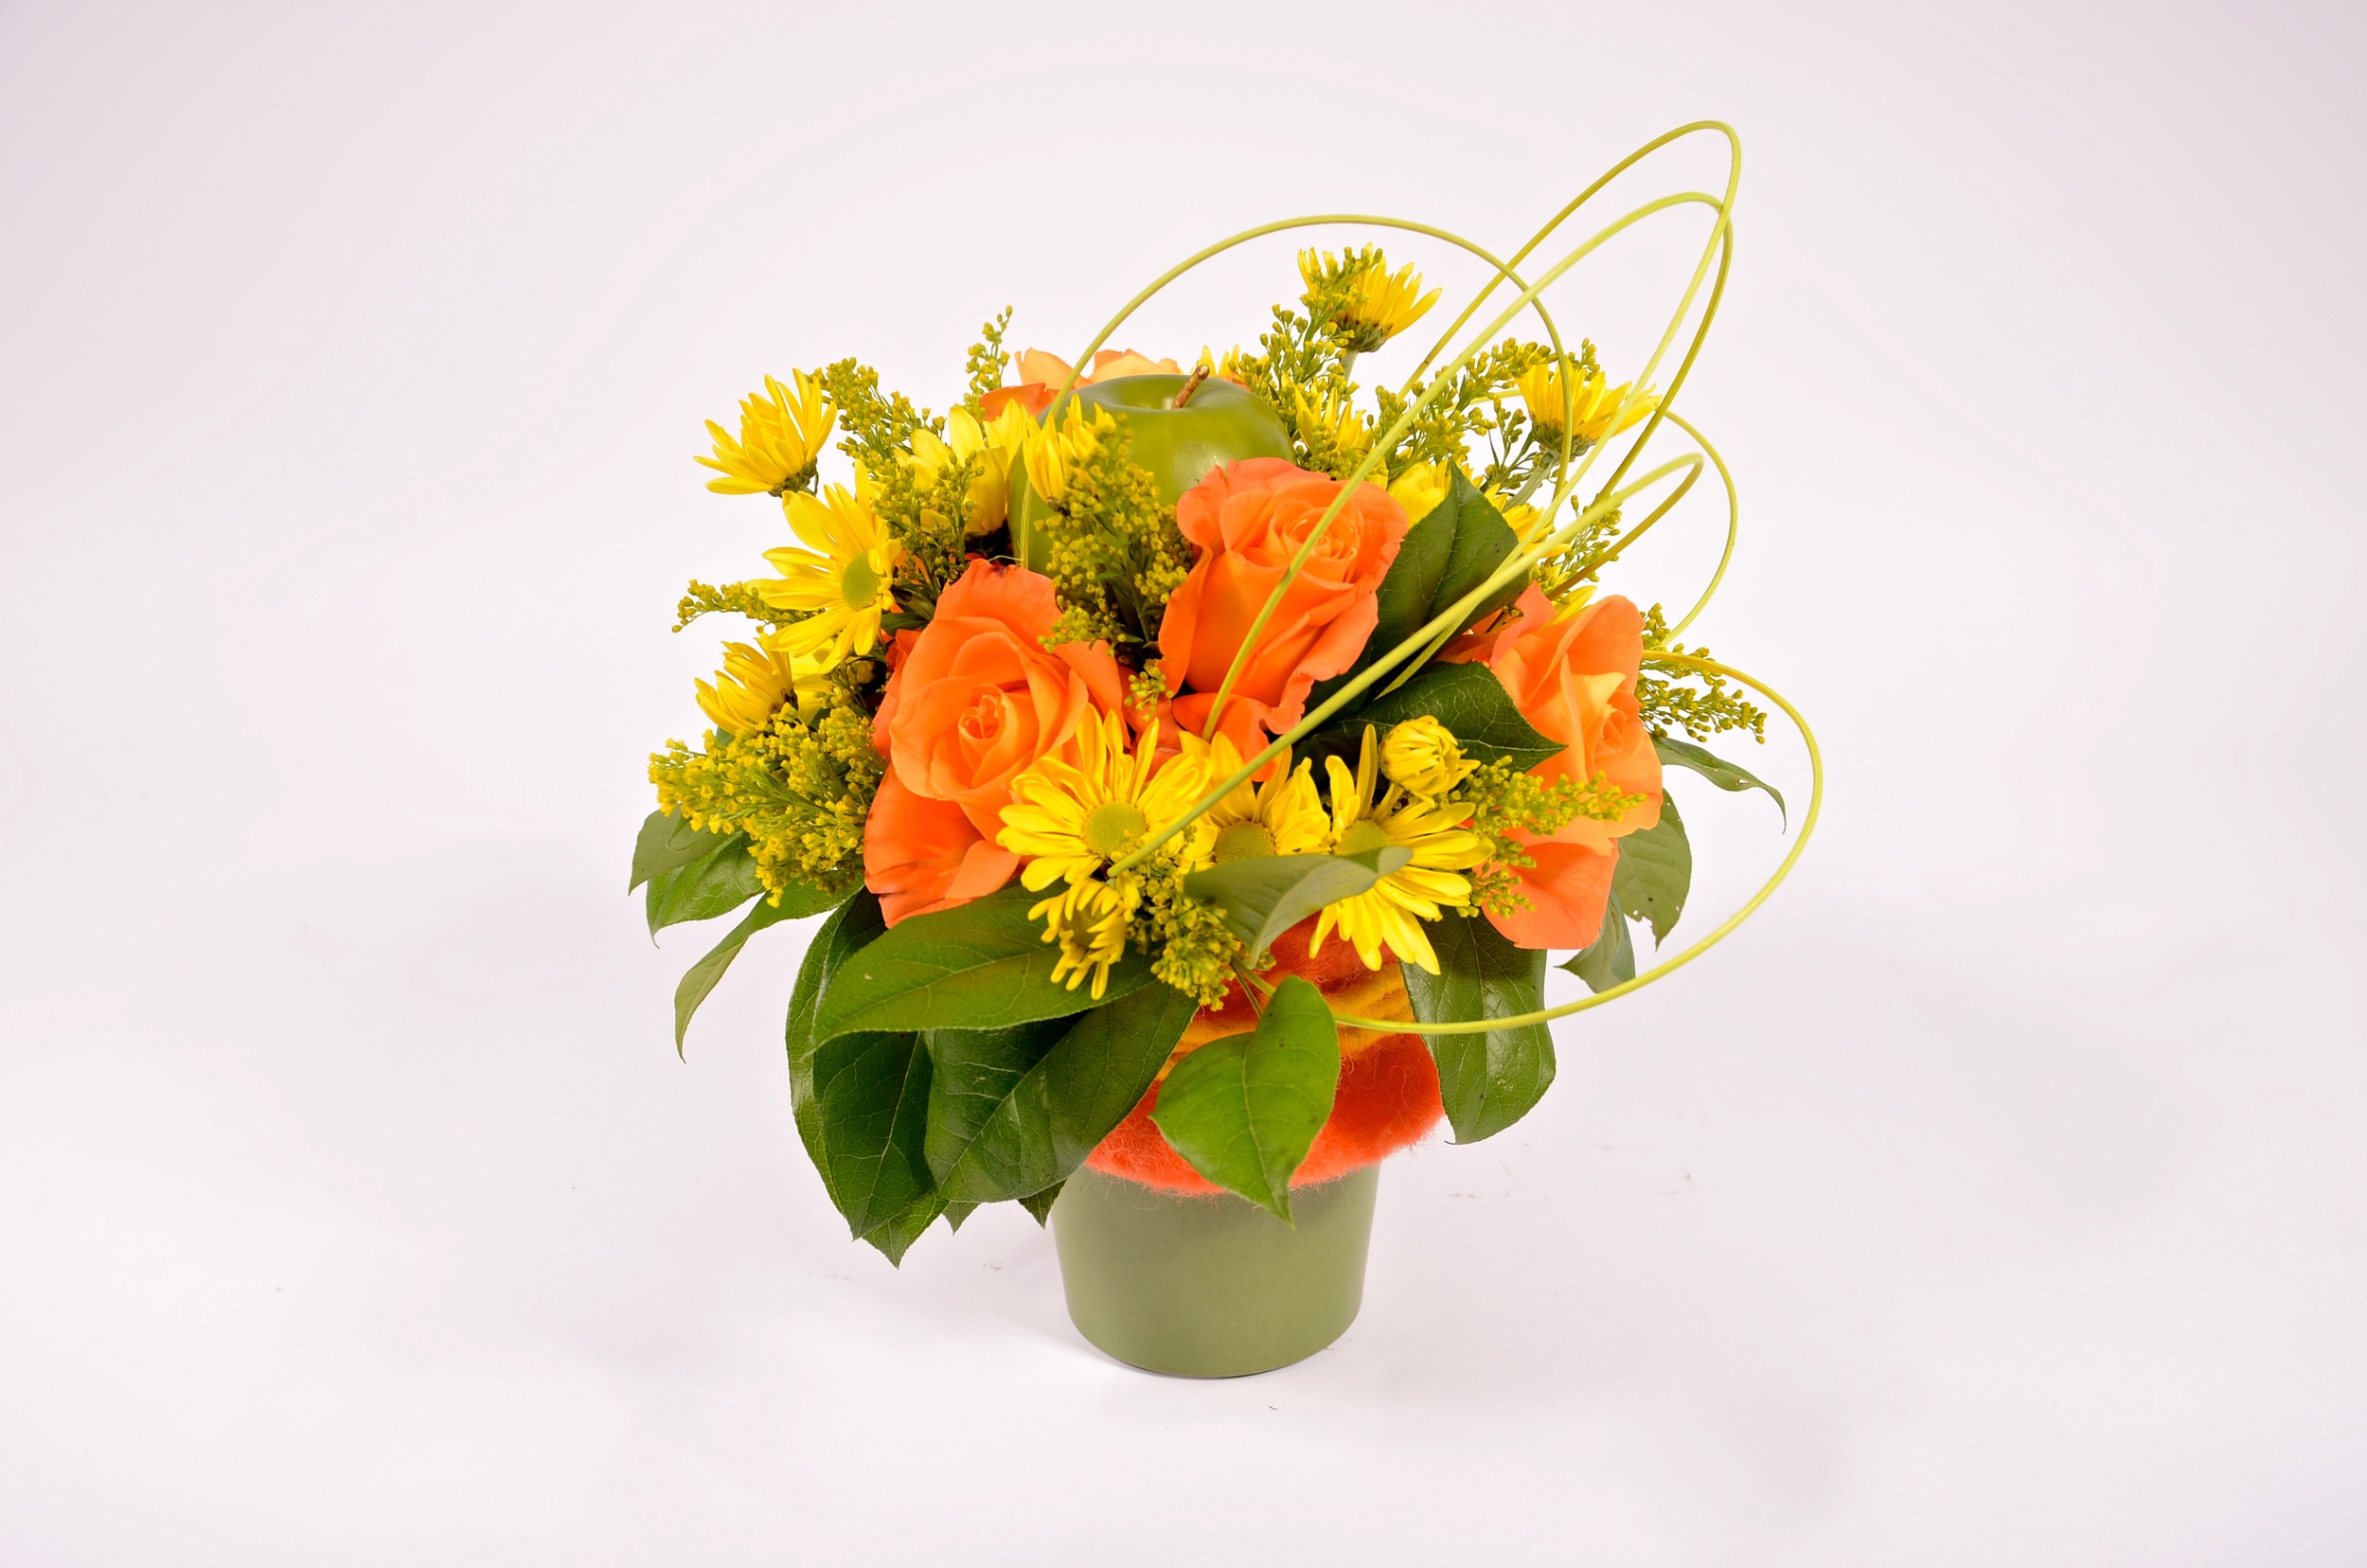 TST_Green-Yellow-Orange_floralrecipe_Ardith_photo.jpeg